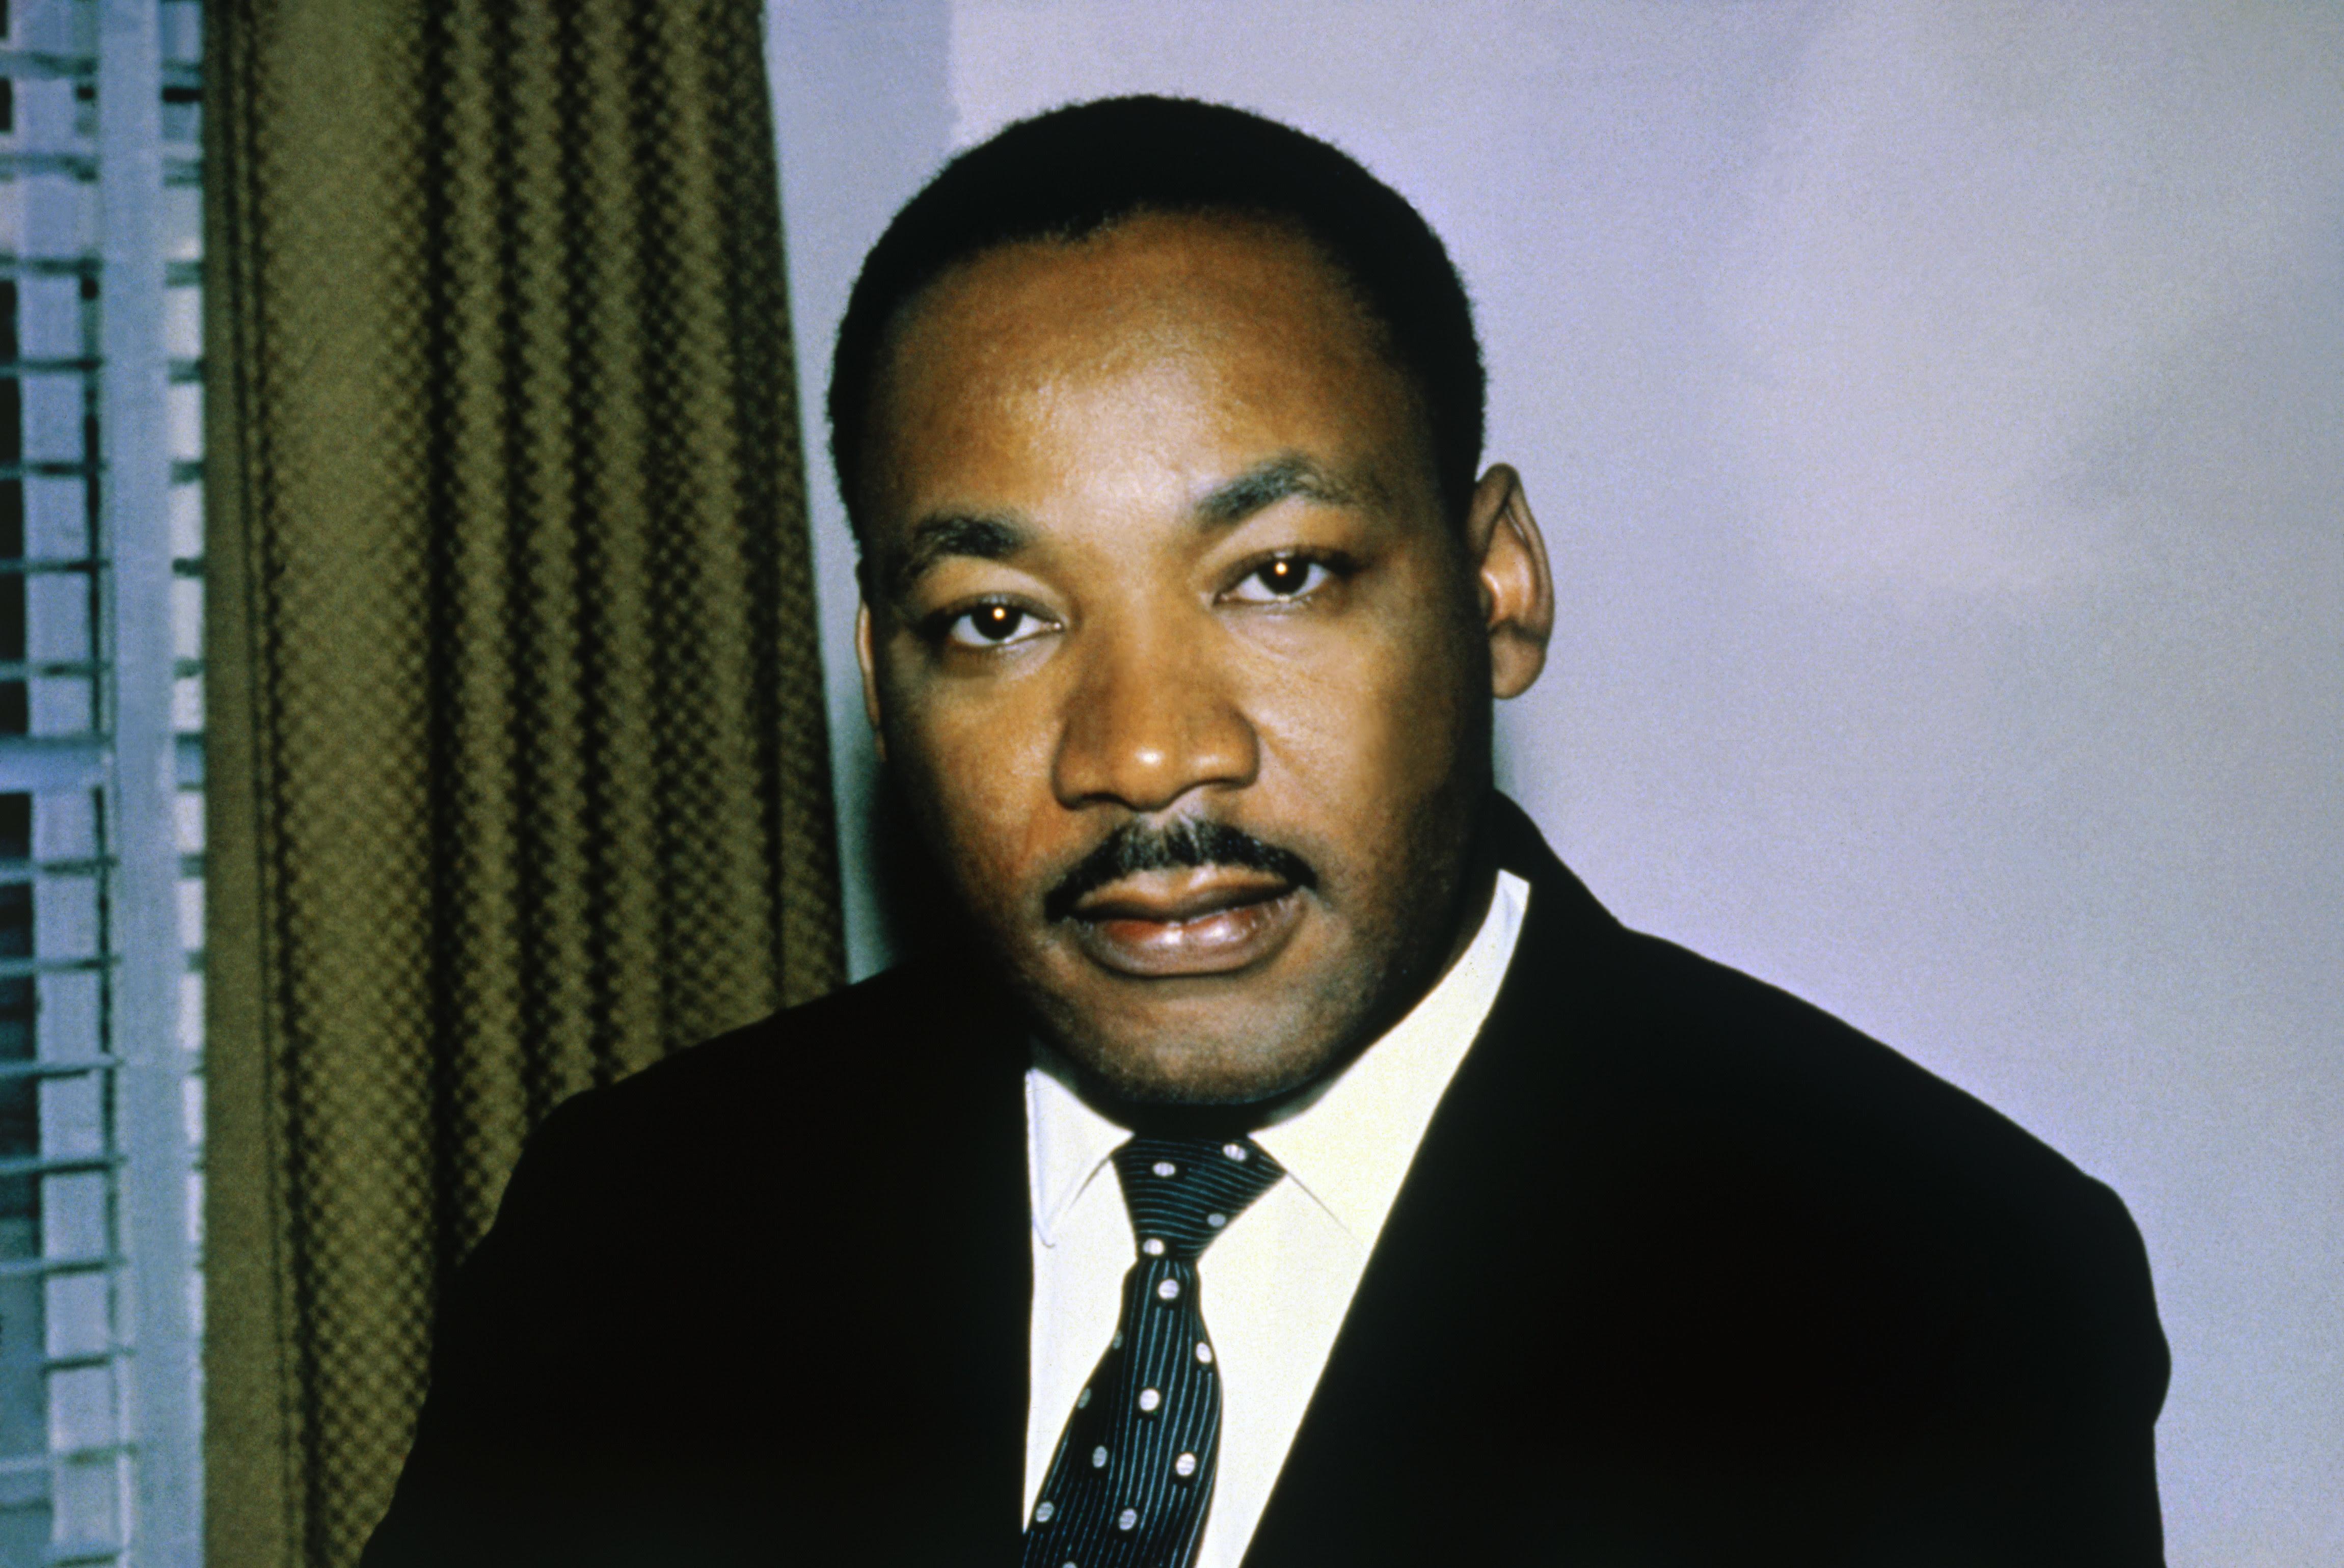 http://cdn.history.com/sites/2/2014/01/martin-luther-king-1966.jpg